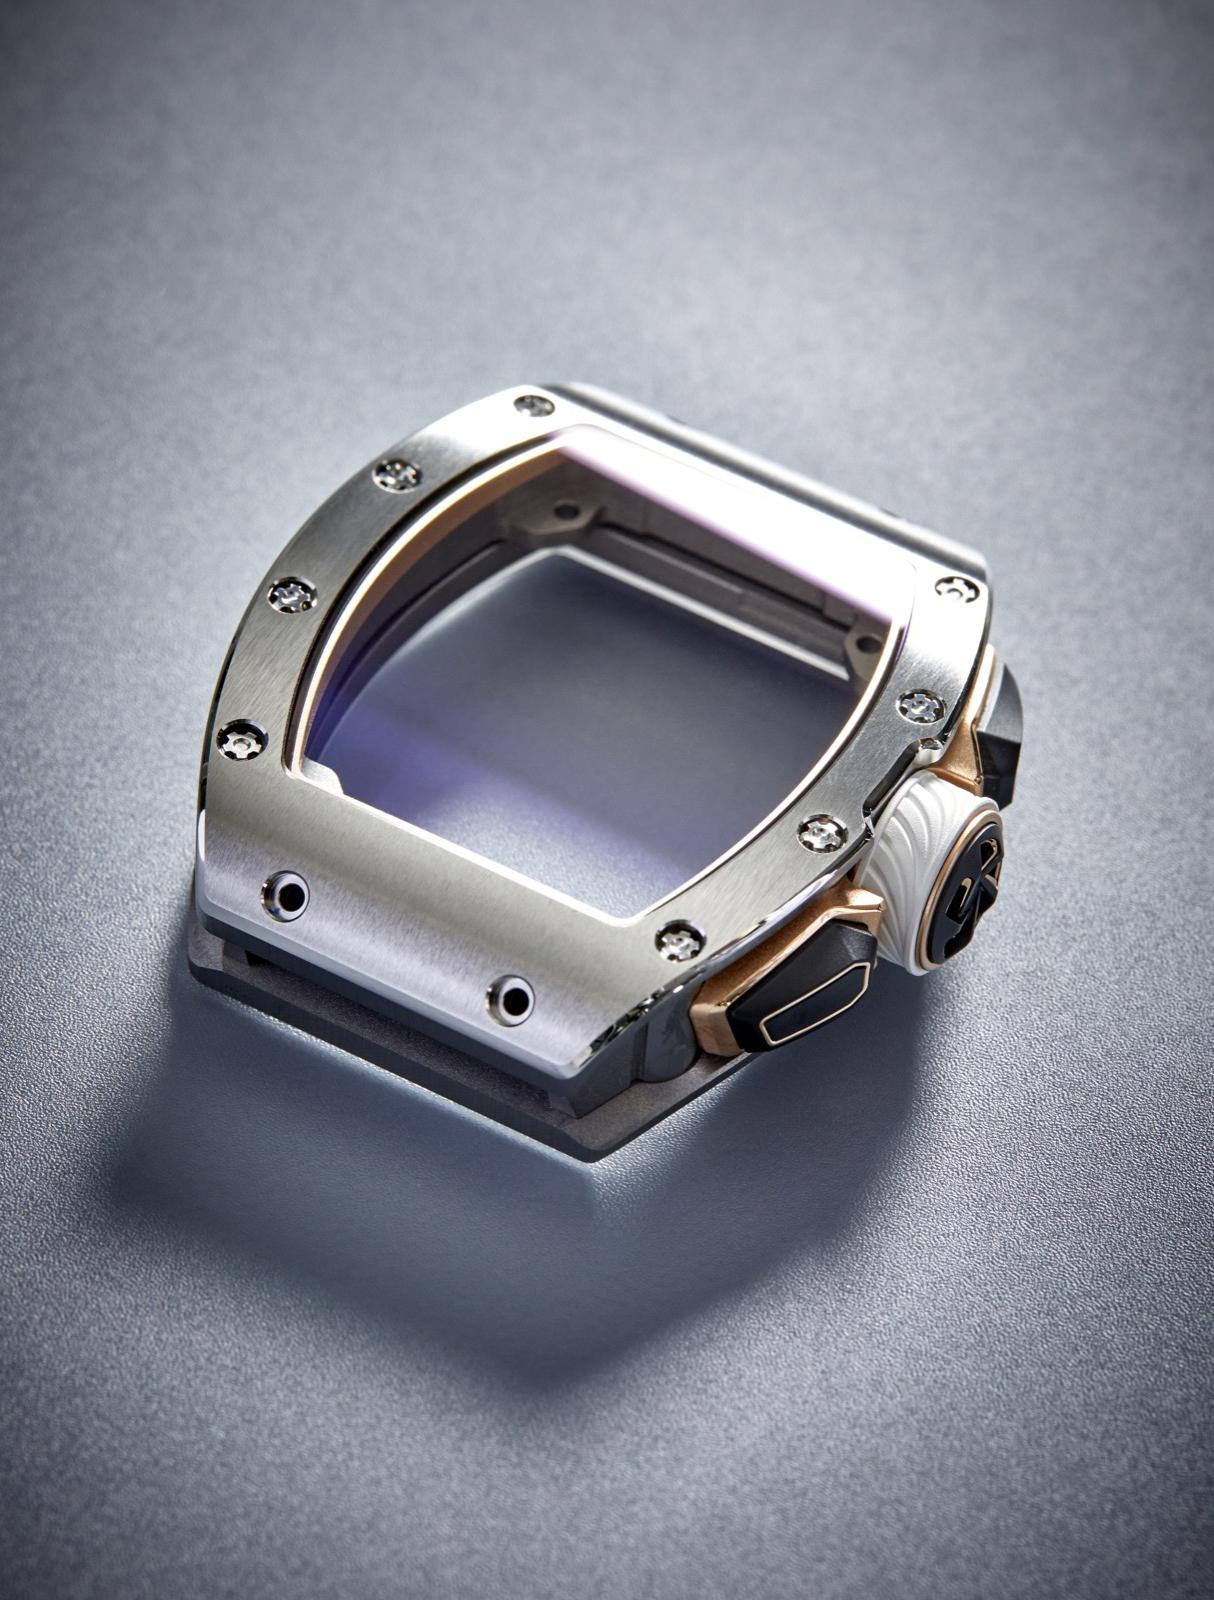 Richard Mille RM 72-01